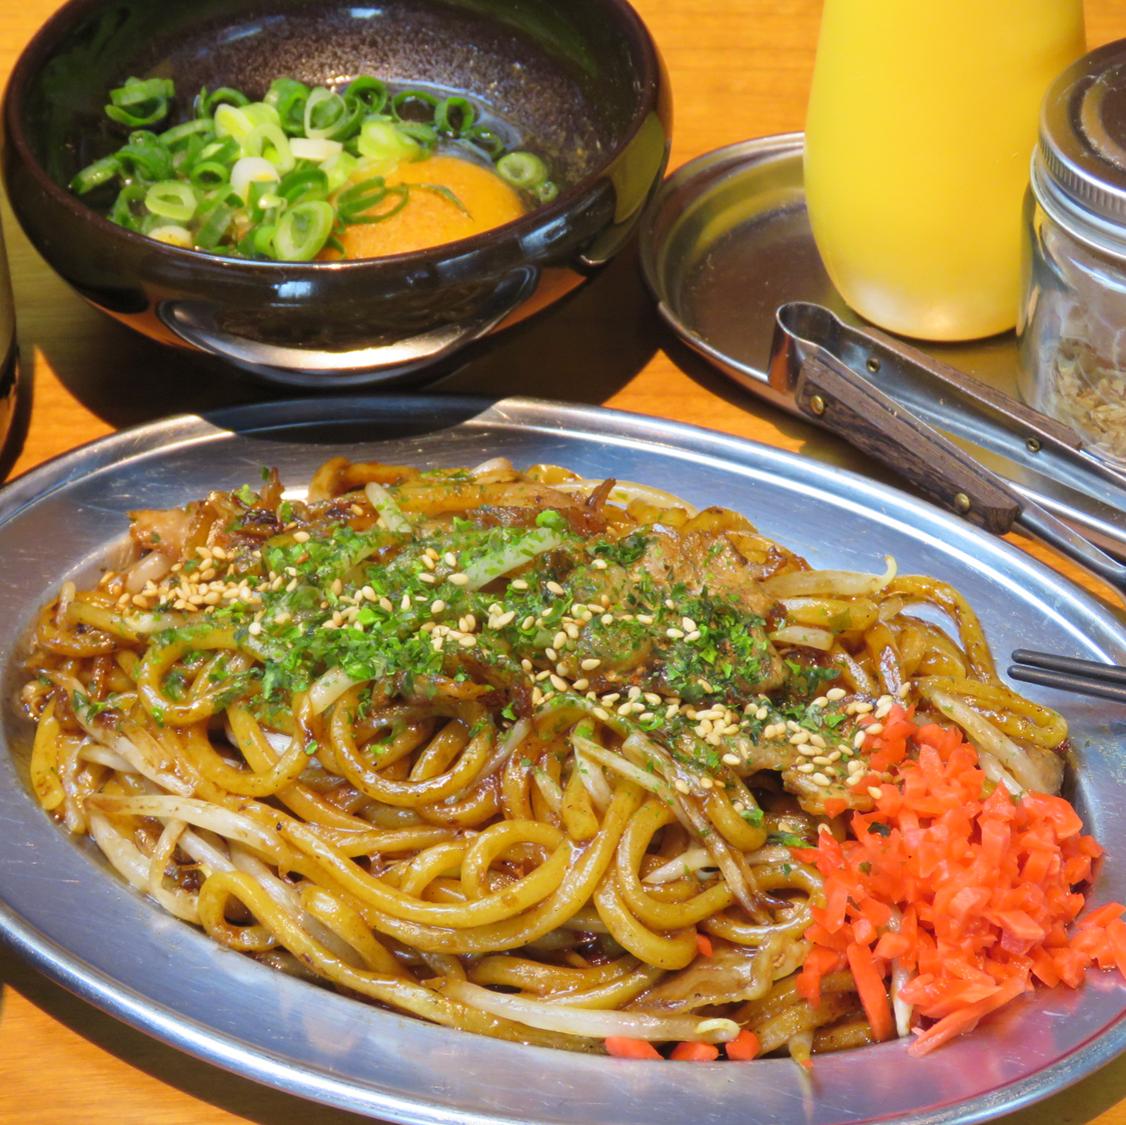 Takosso炒麵/大量的蔬菜炒麵